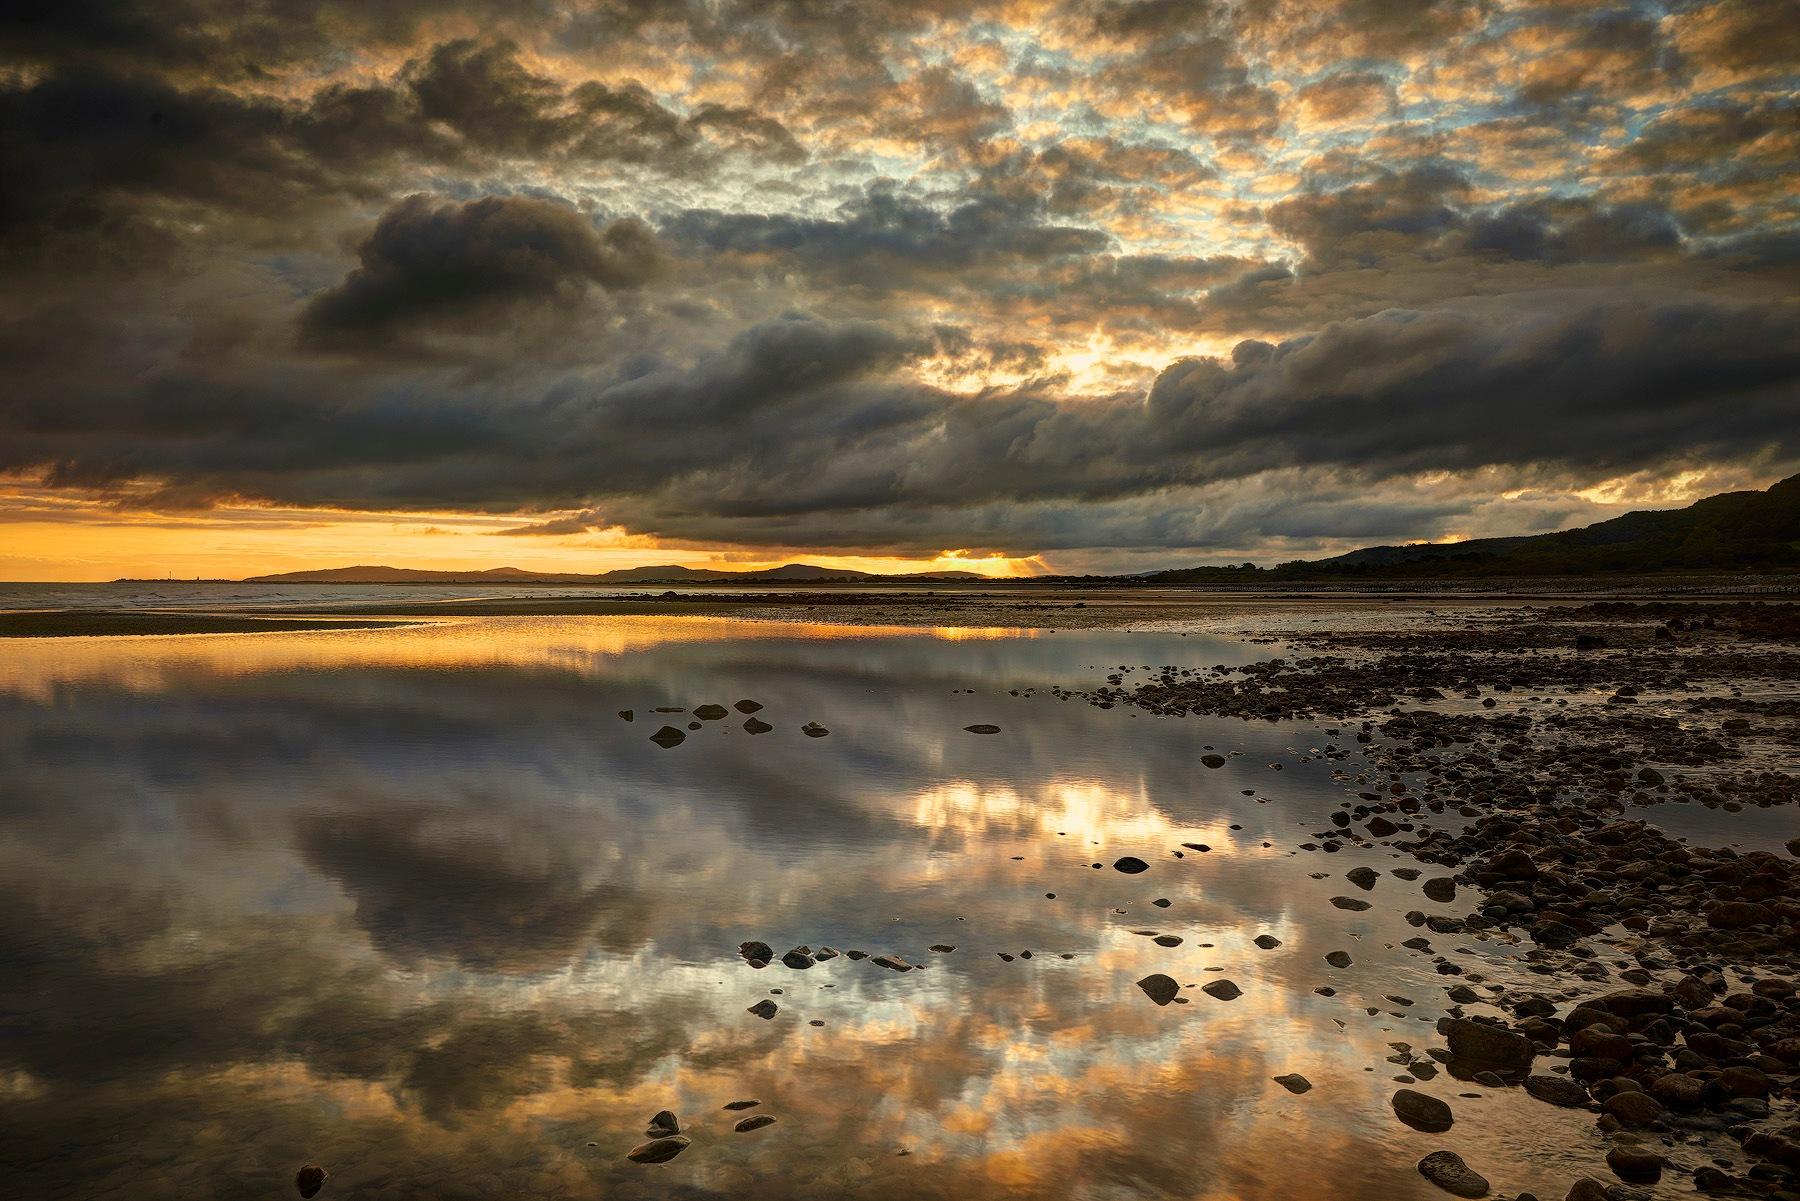 Sunrise At The Beach (Llanddulas) North Wales by John Corney